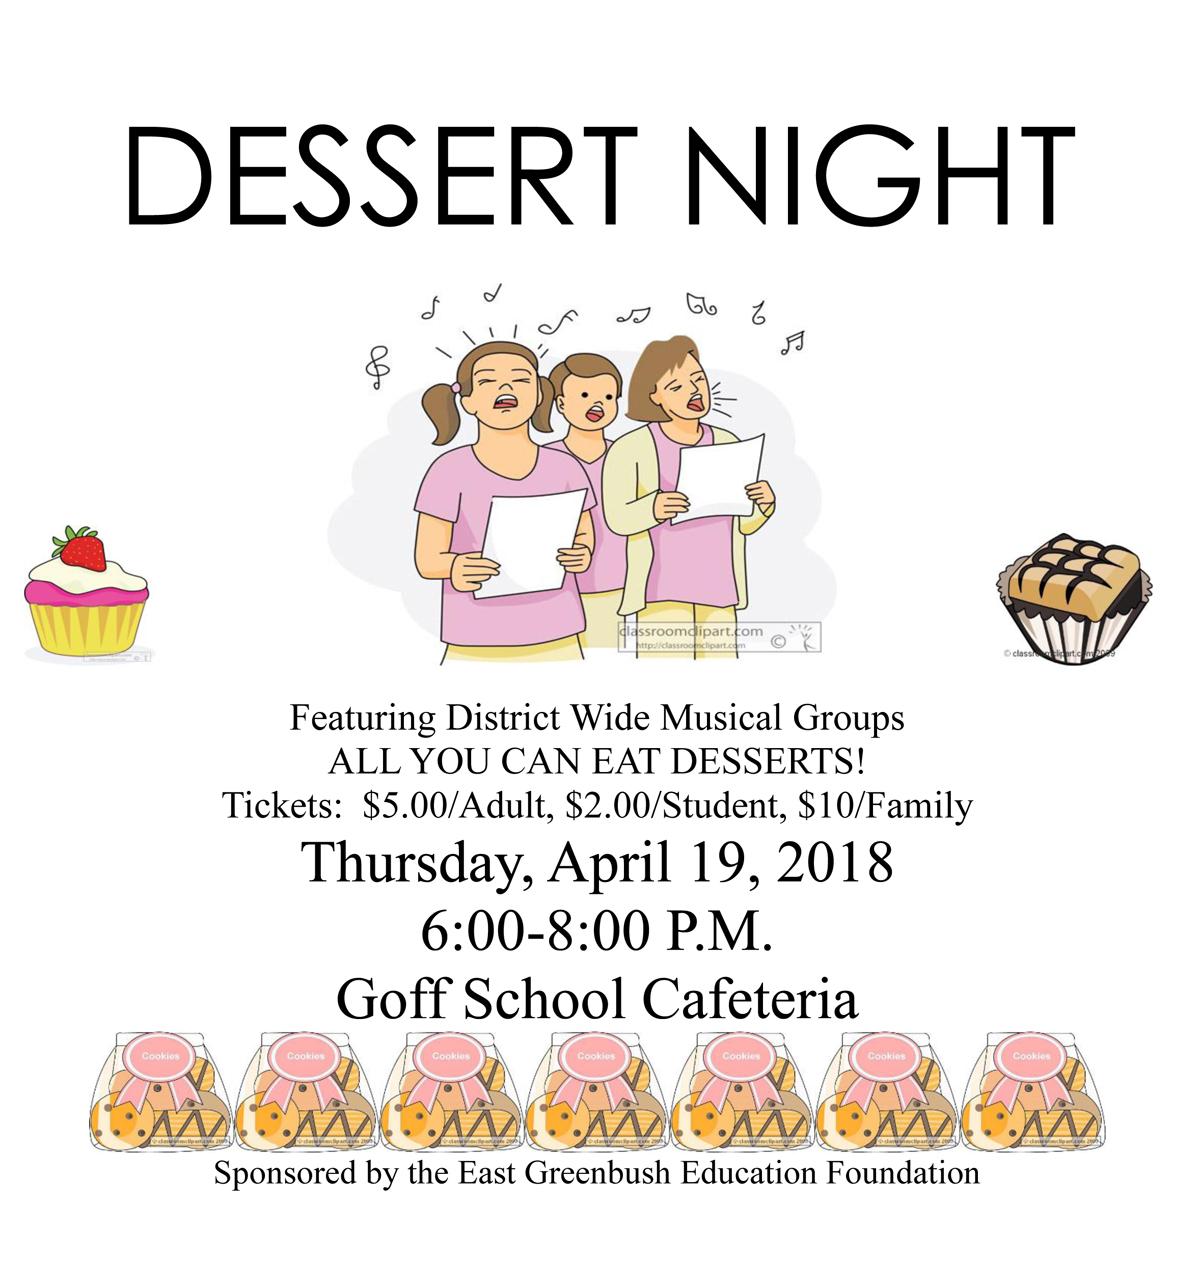 Dessert Night flyer